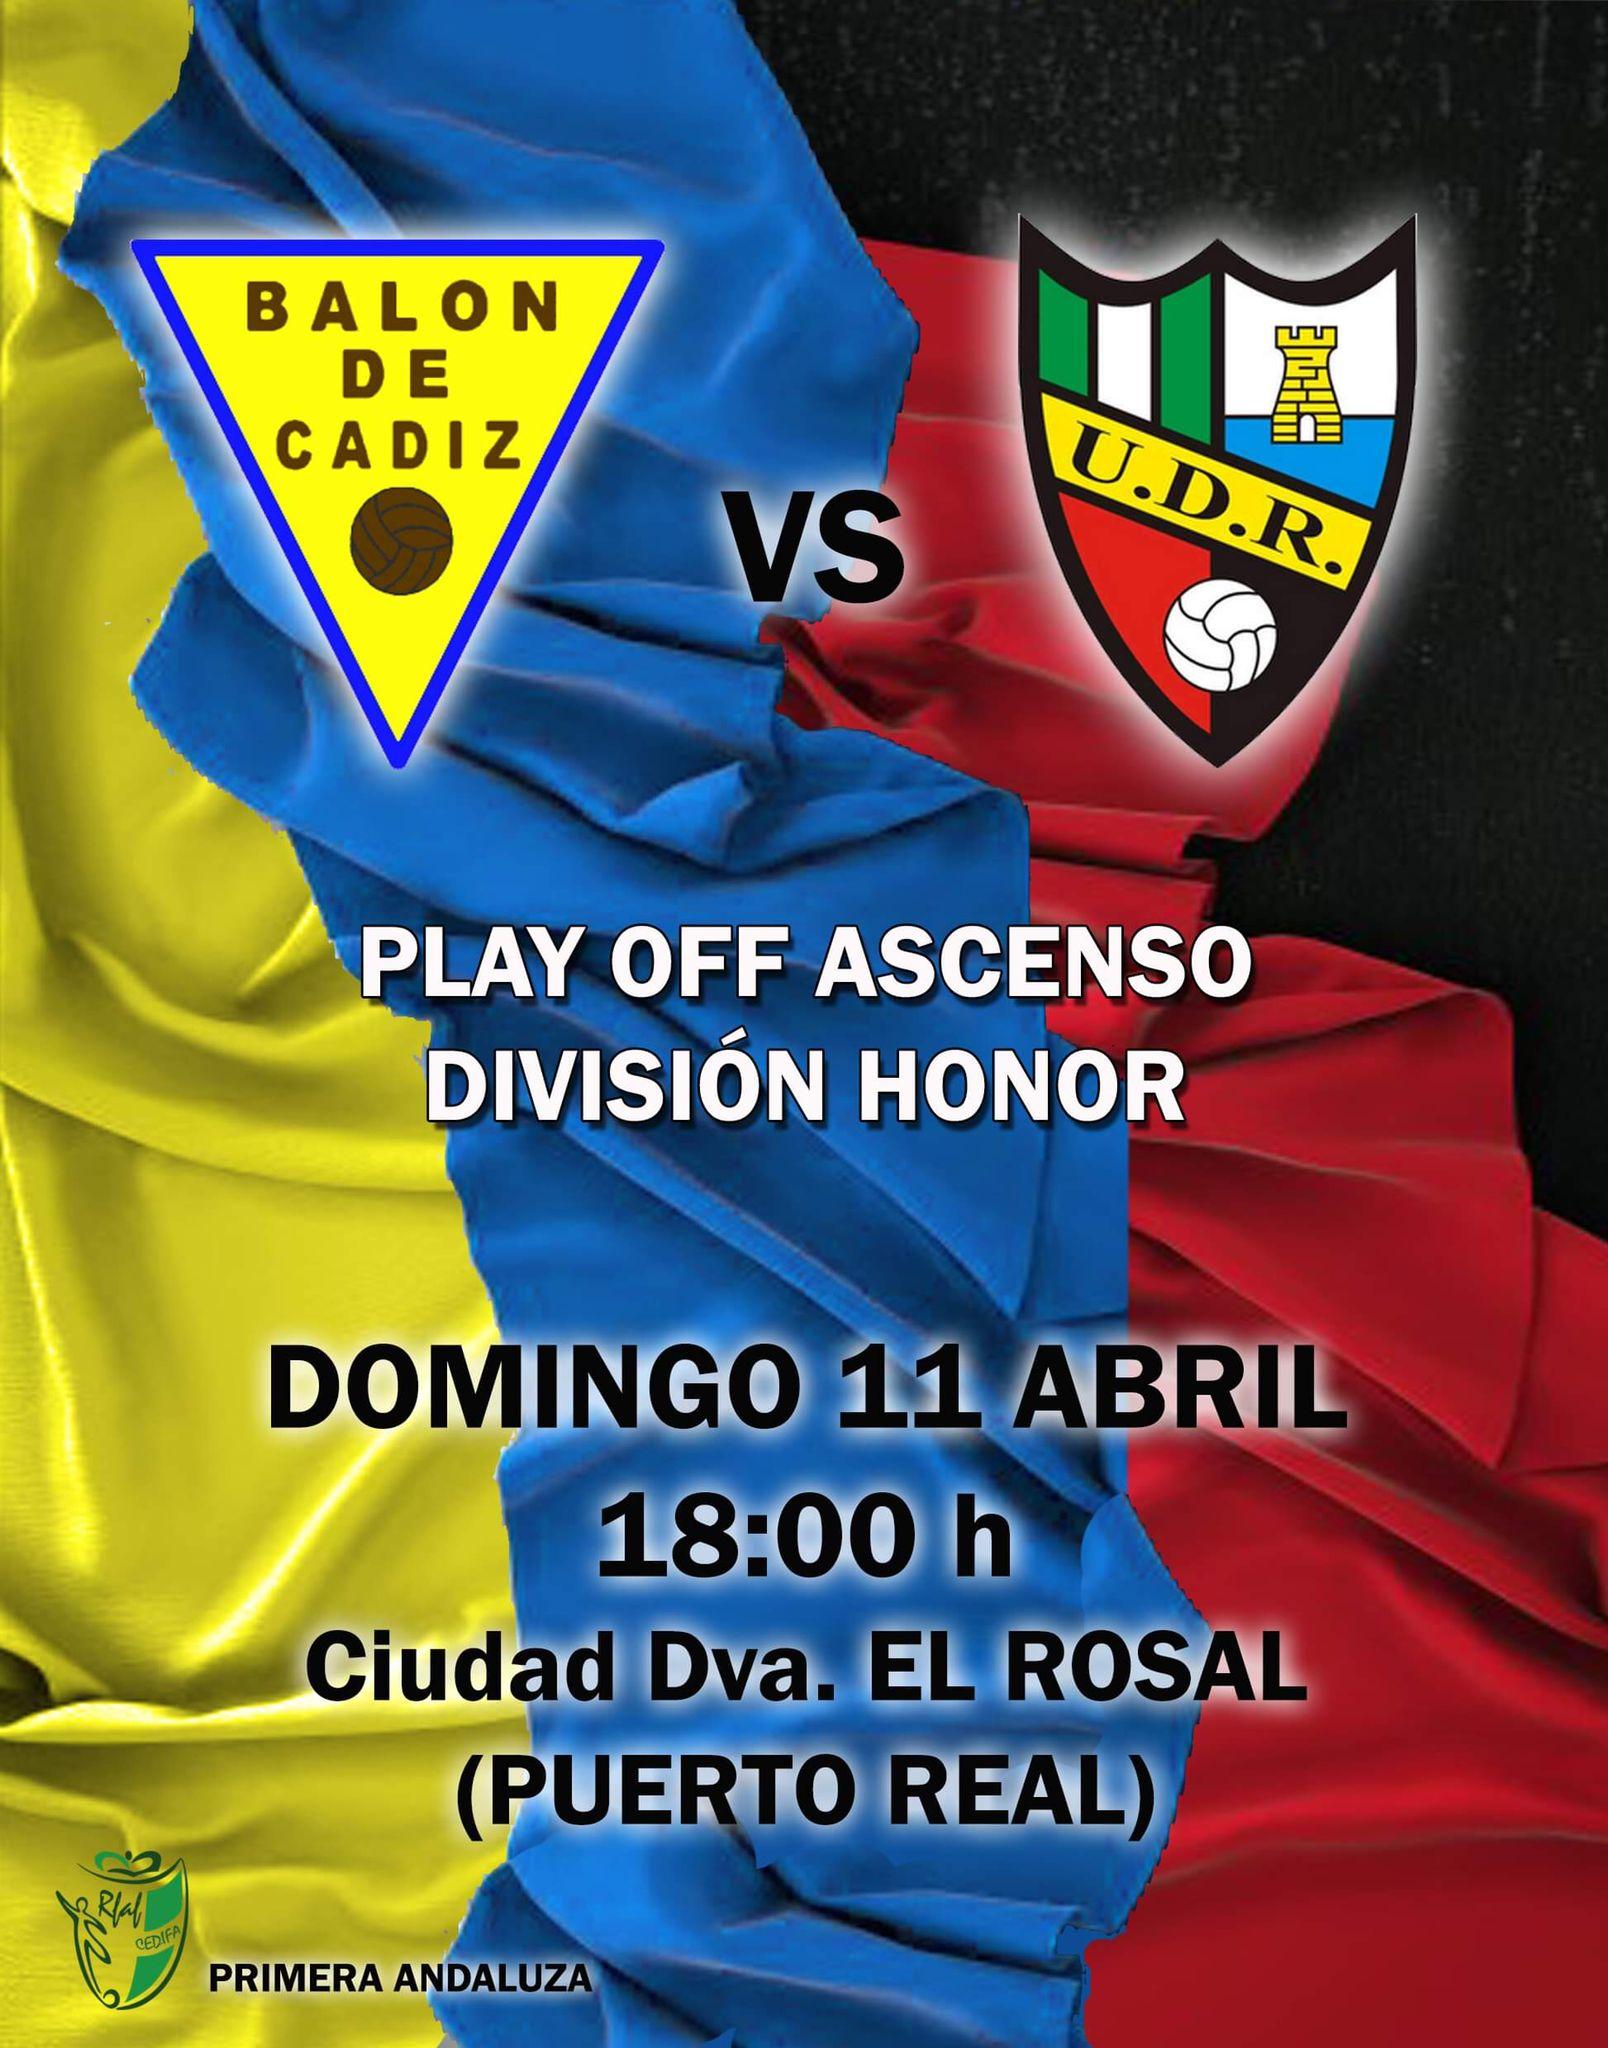 sdsBalón de Cádiz - UD Roteña